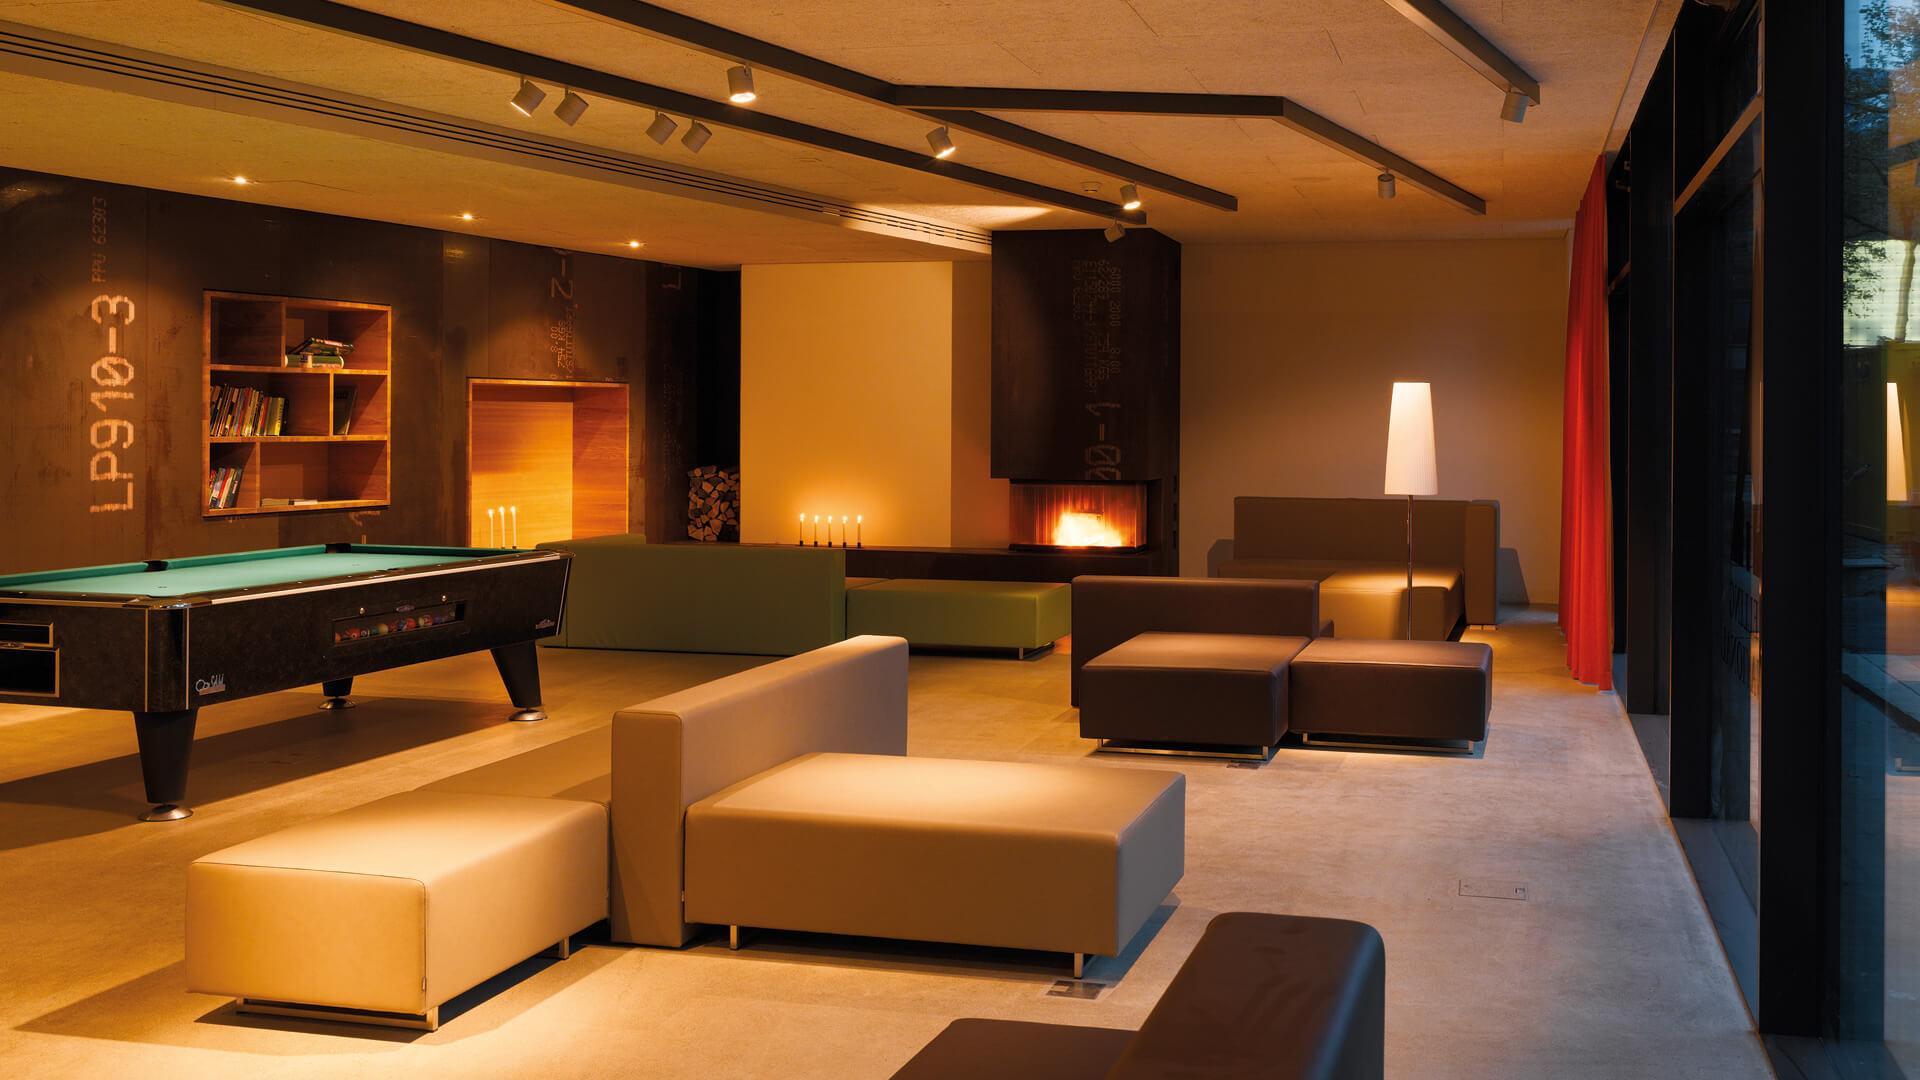 restaurant-3-a-lounge